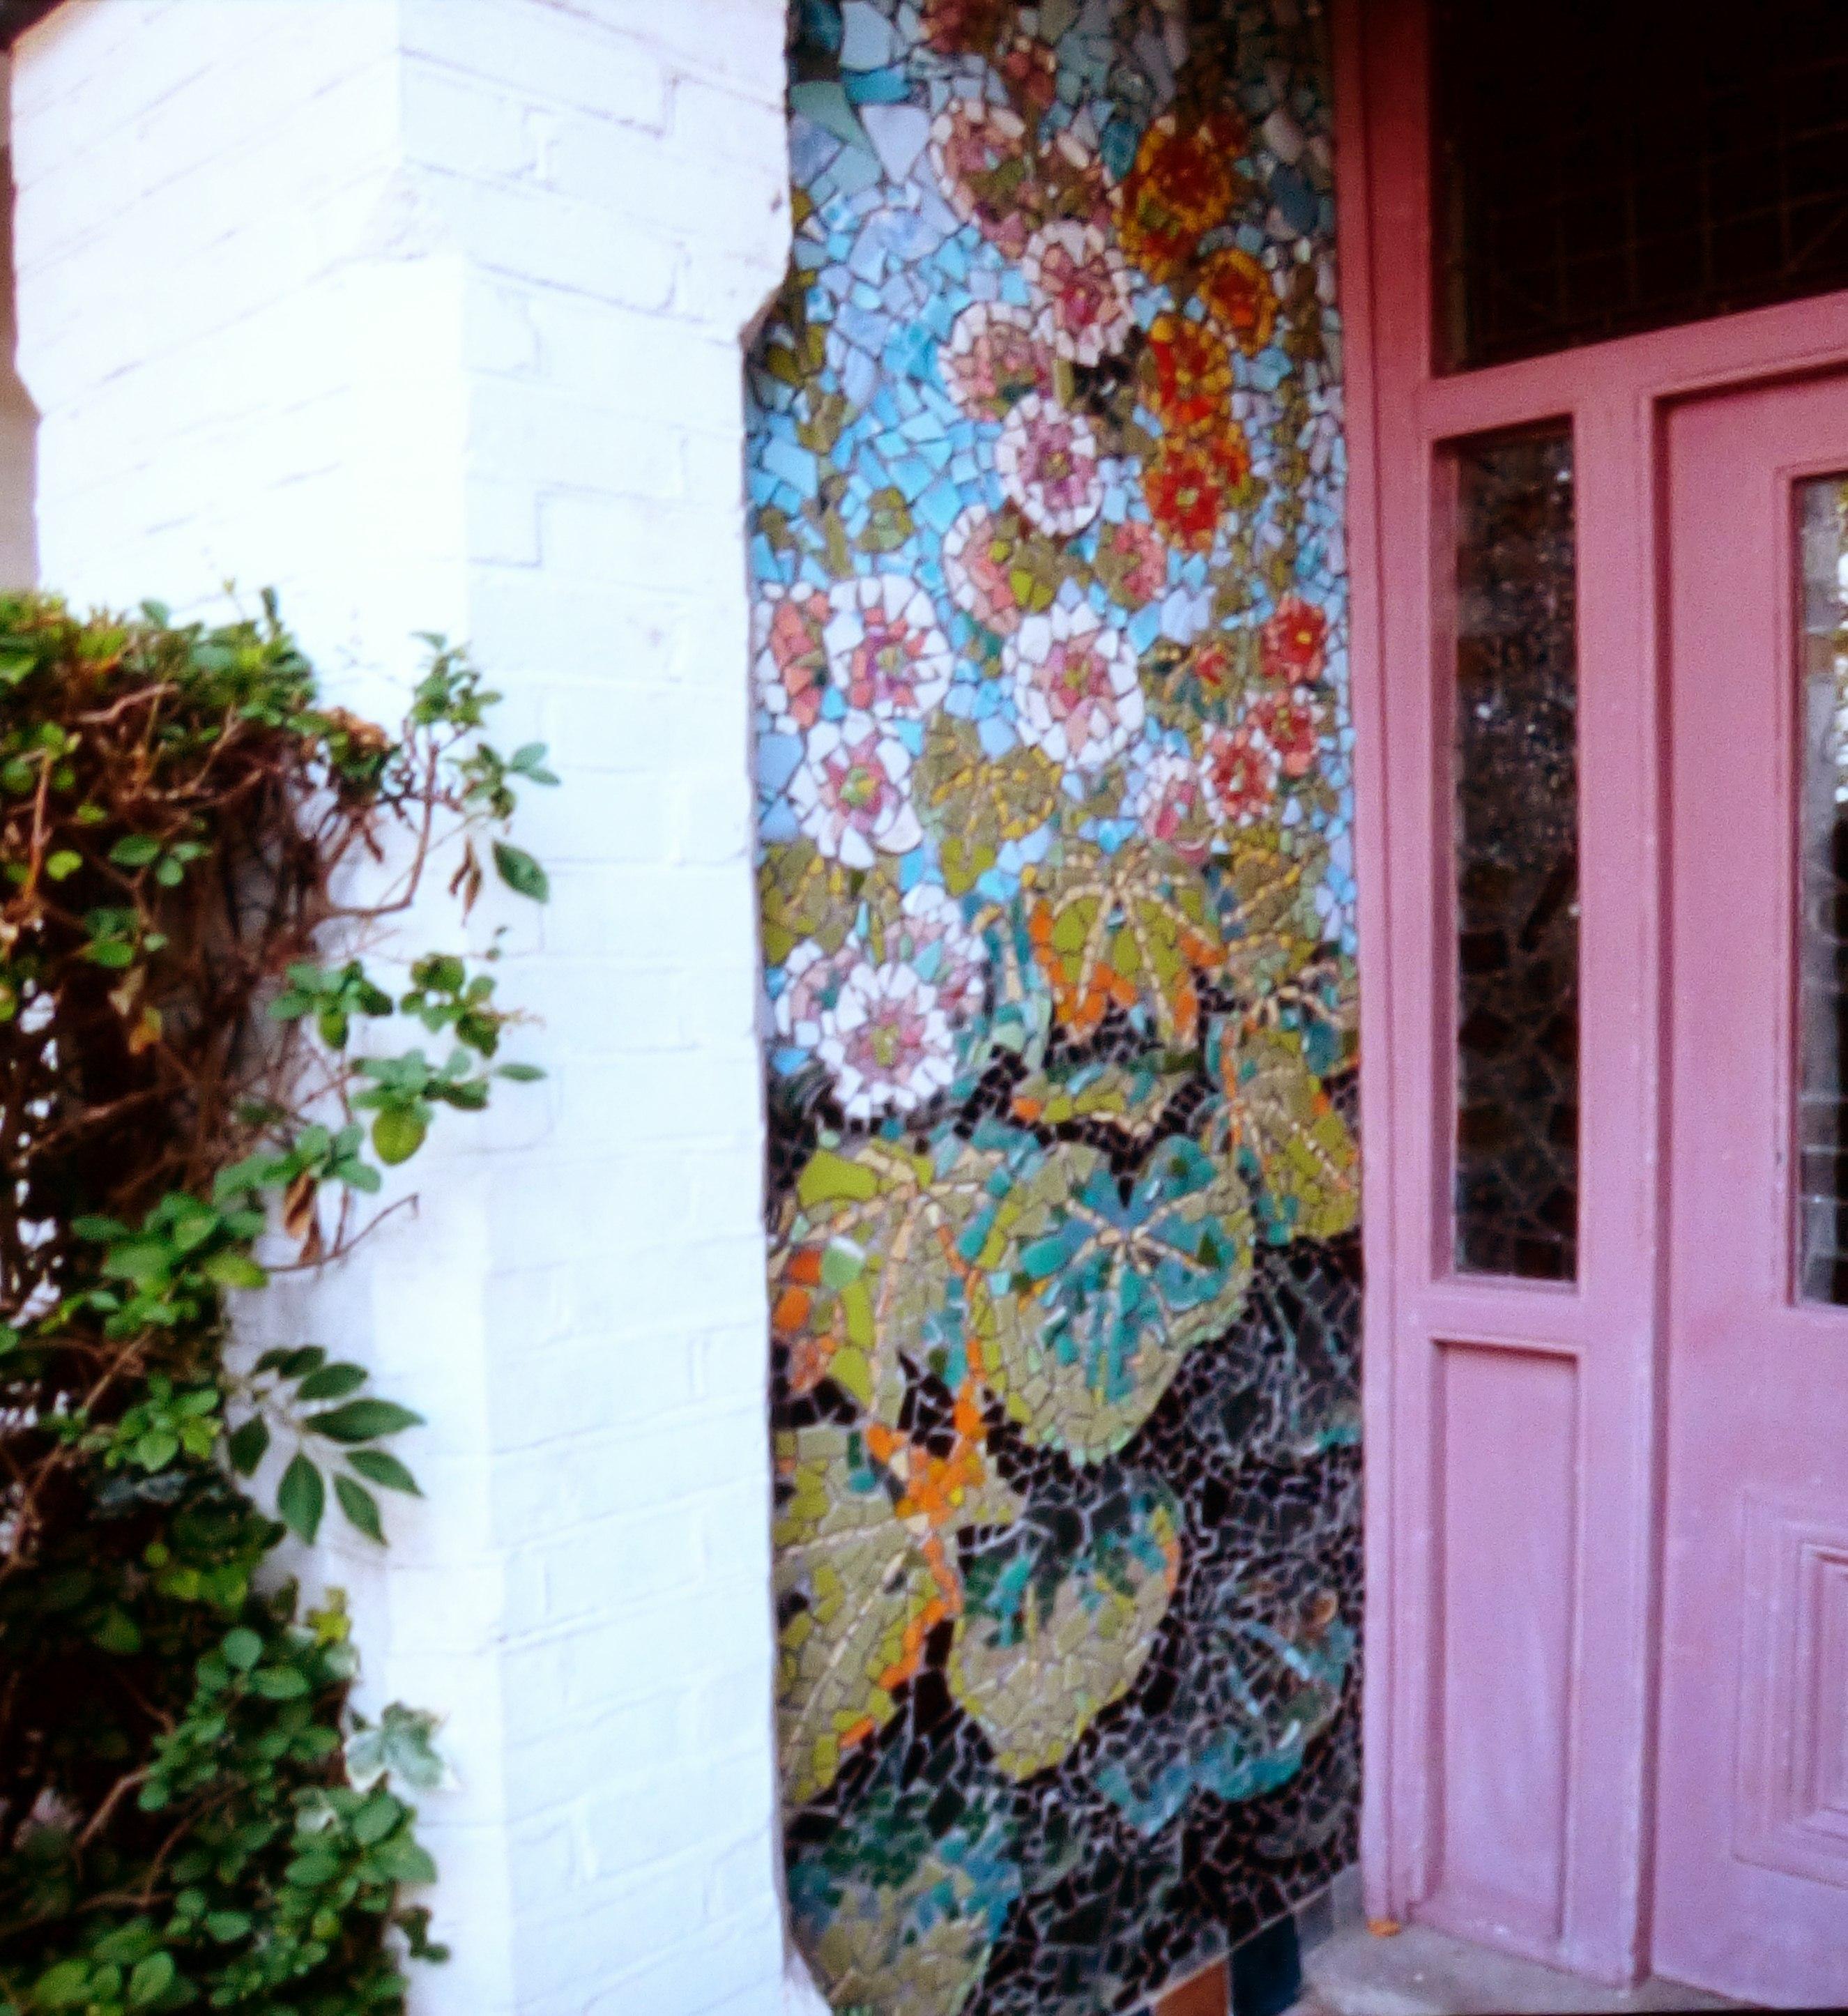 slide showing mosaic wall at Kaffe Fassett's home, Kaffe Fassett Lecture, Capstone Theatre, Dec 2016